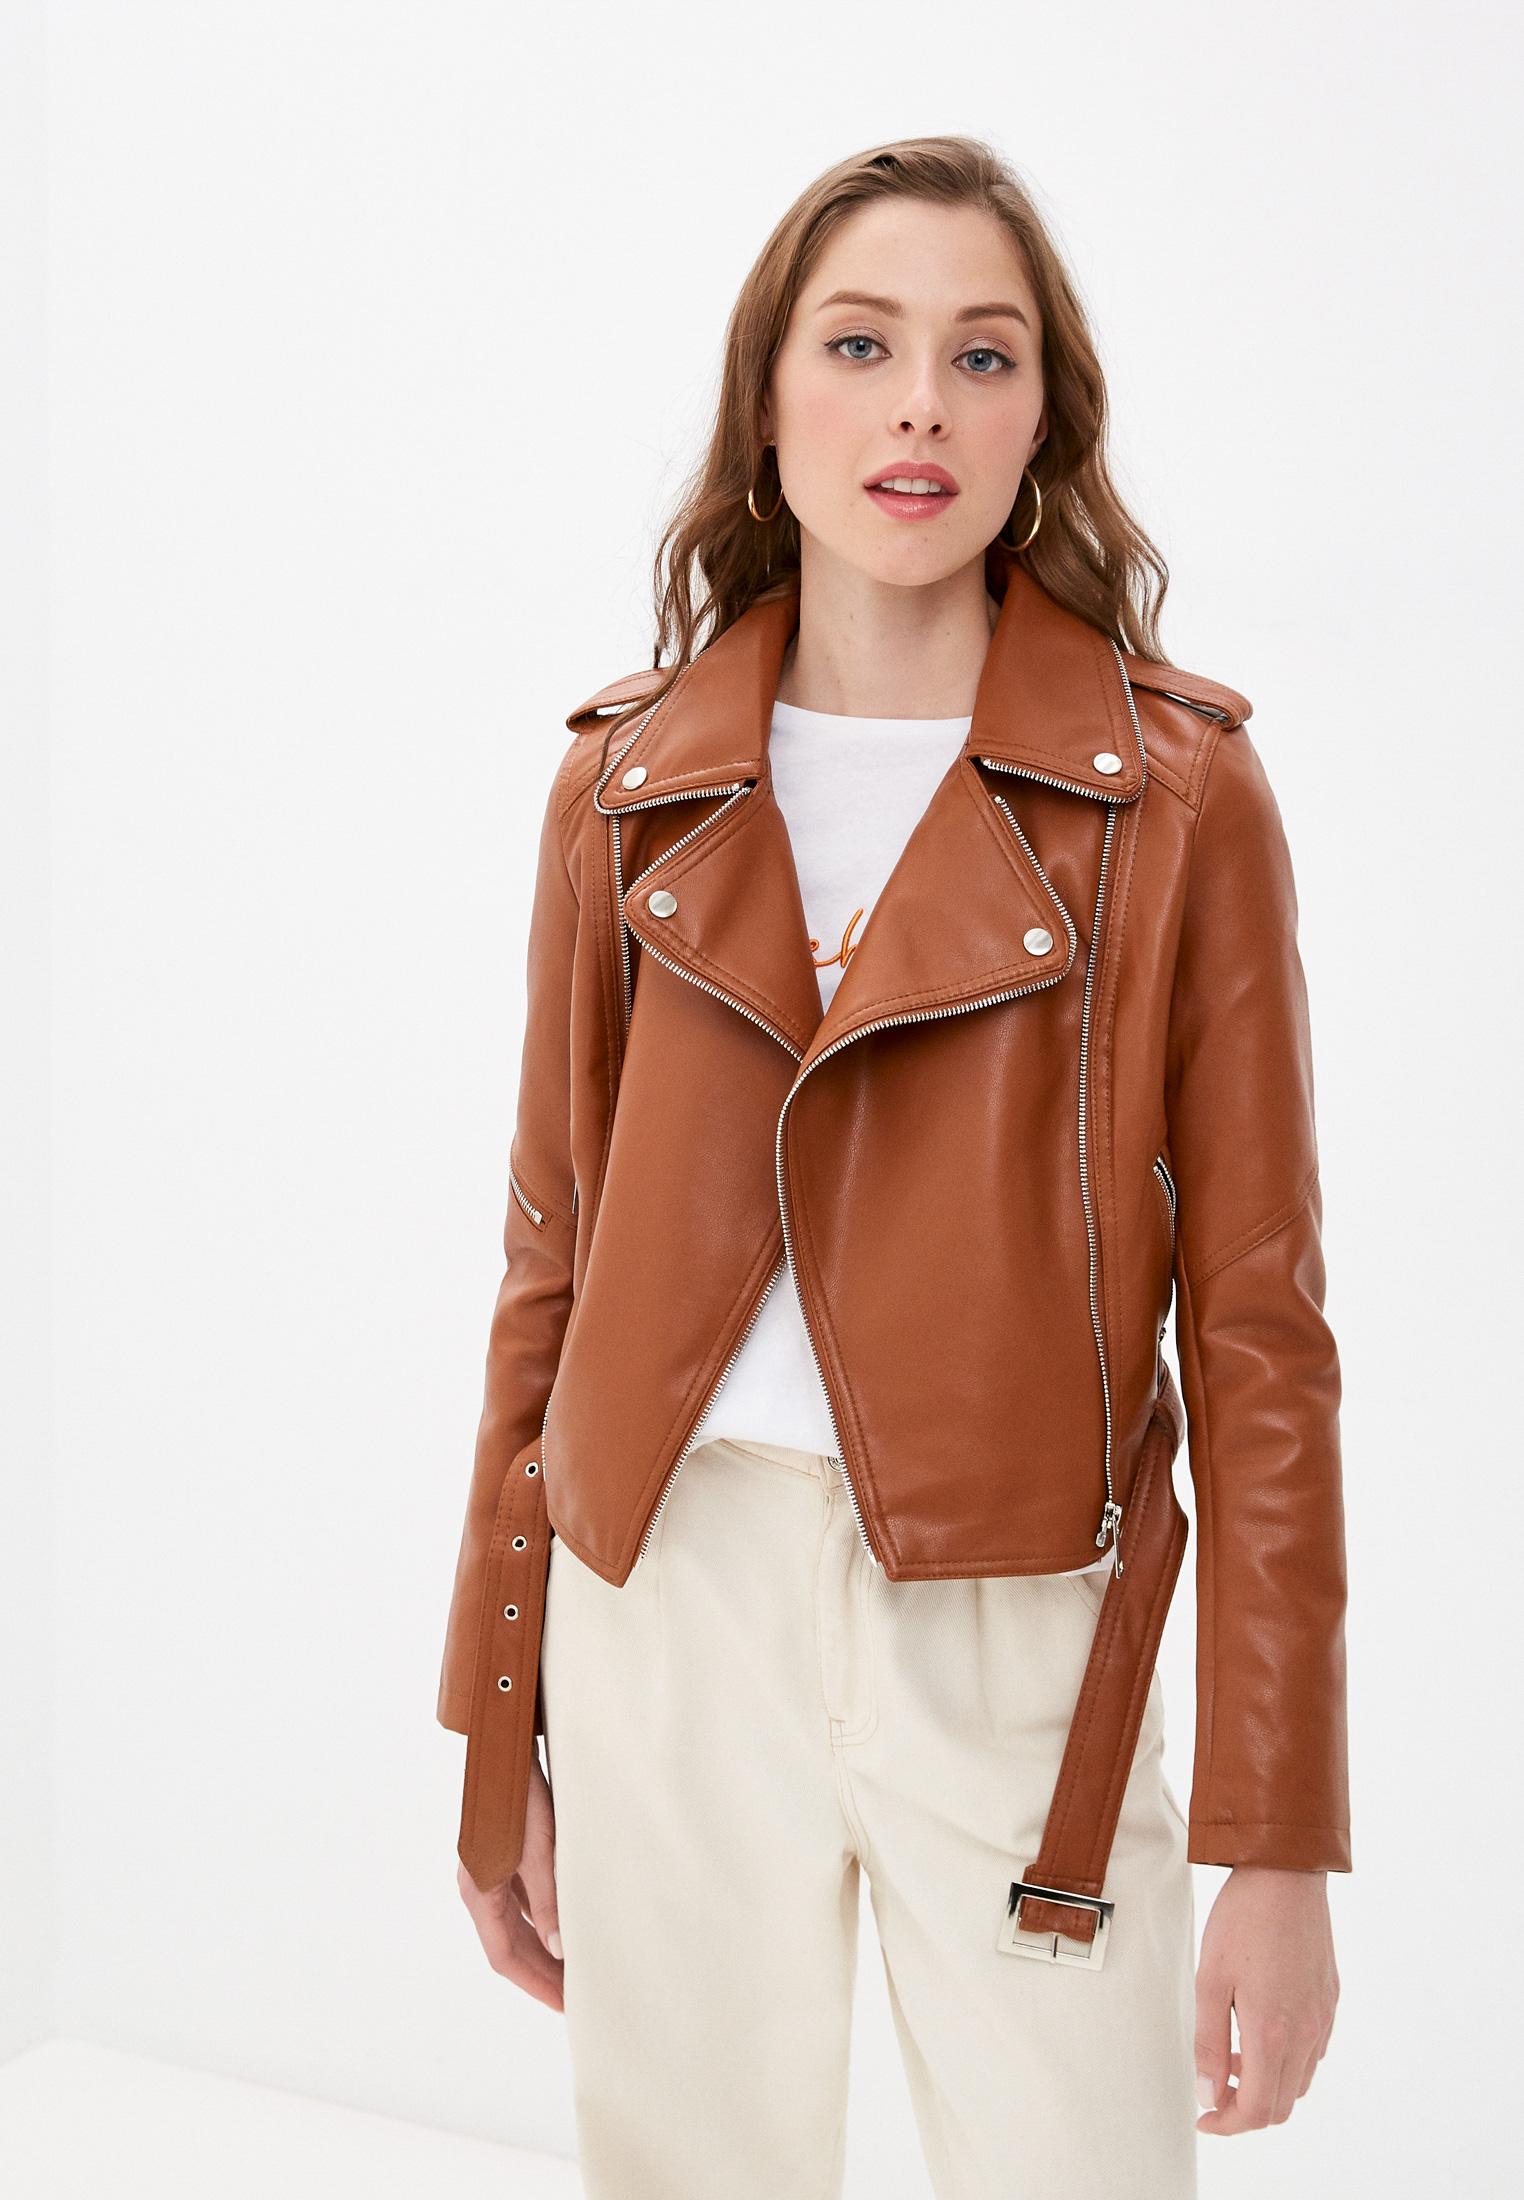 Кожаная куртка Adrixx Куртка кожаная Adrixx